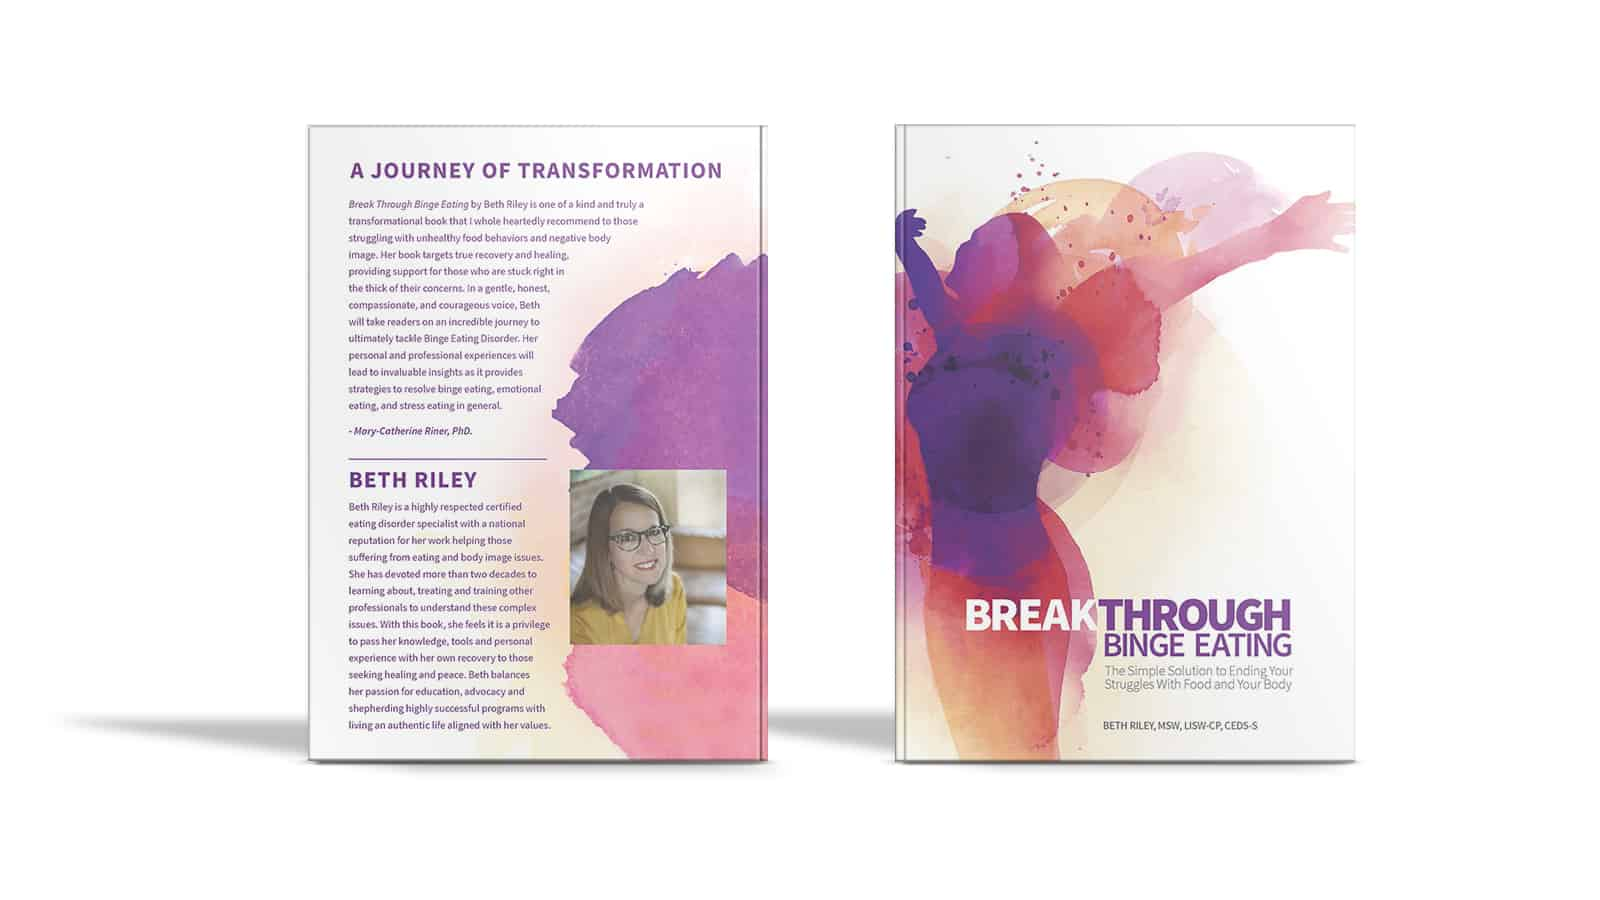 JLVAS-website-example-book-Breakthrough Binge Eating